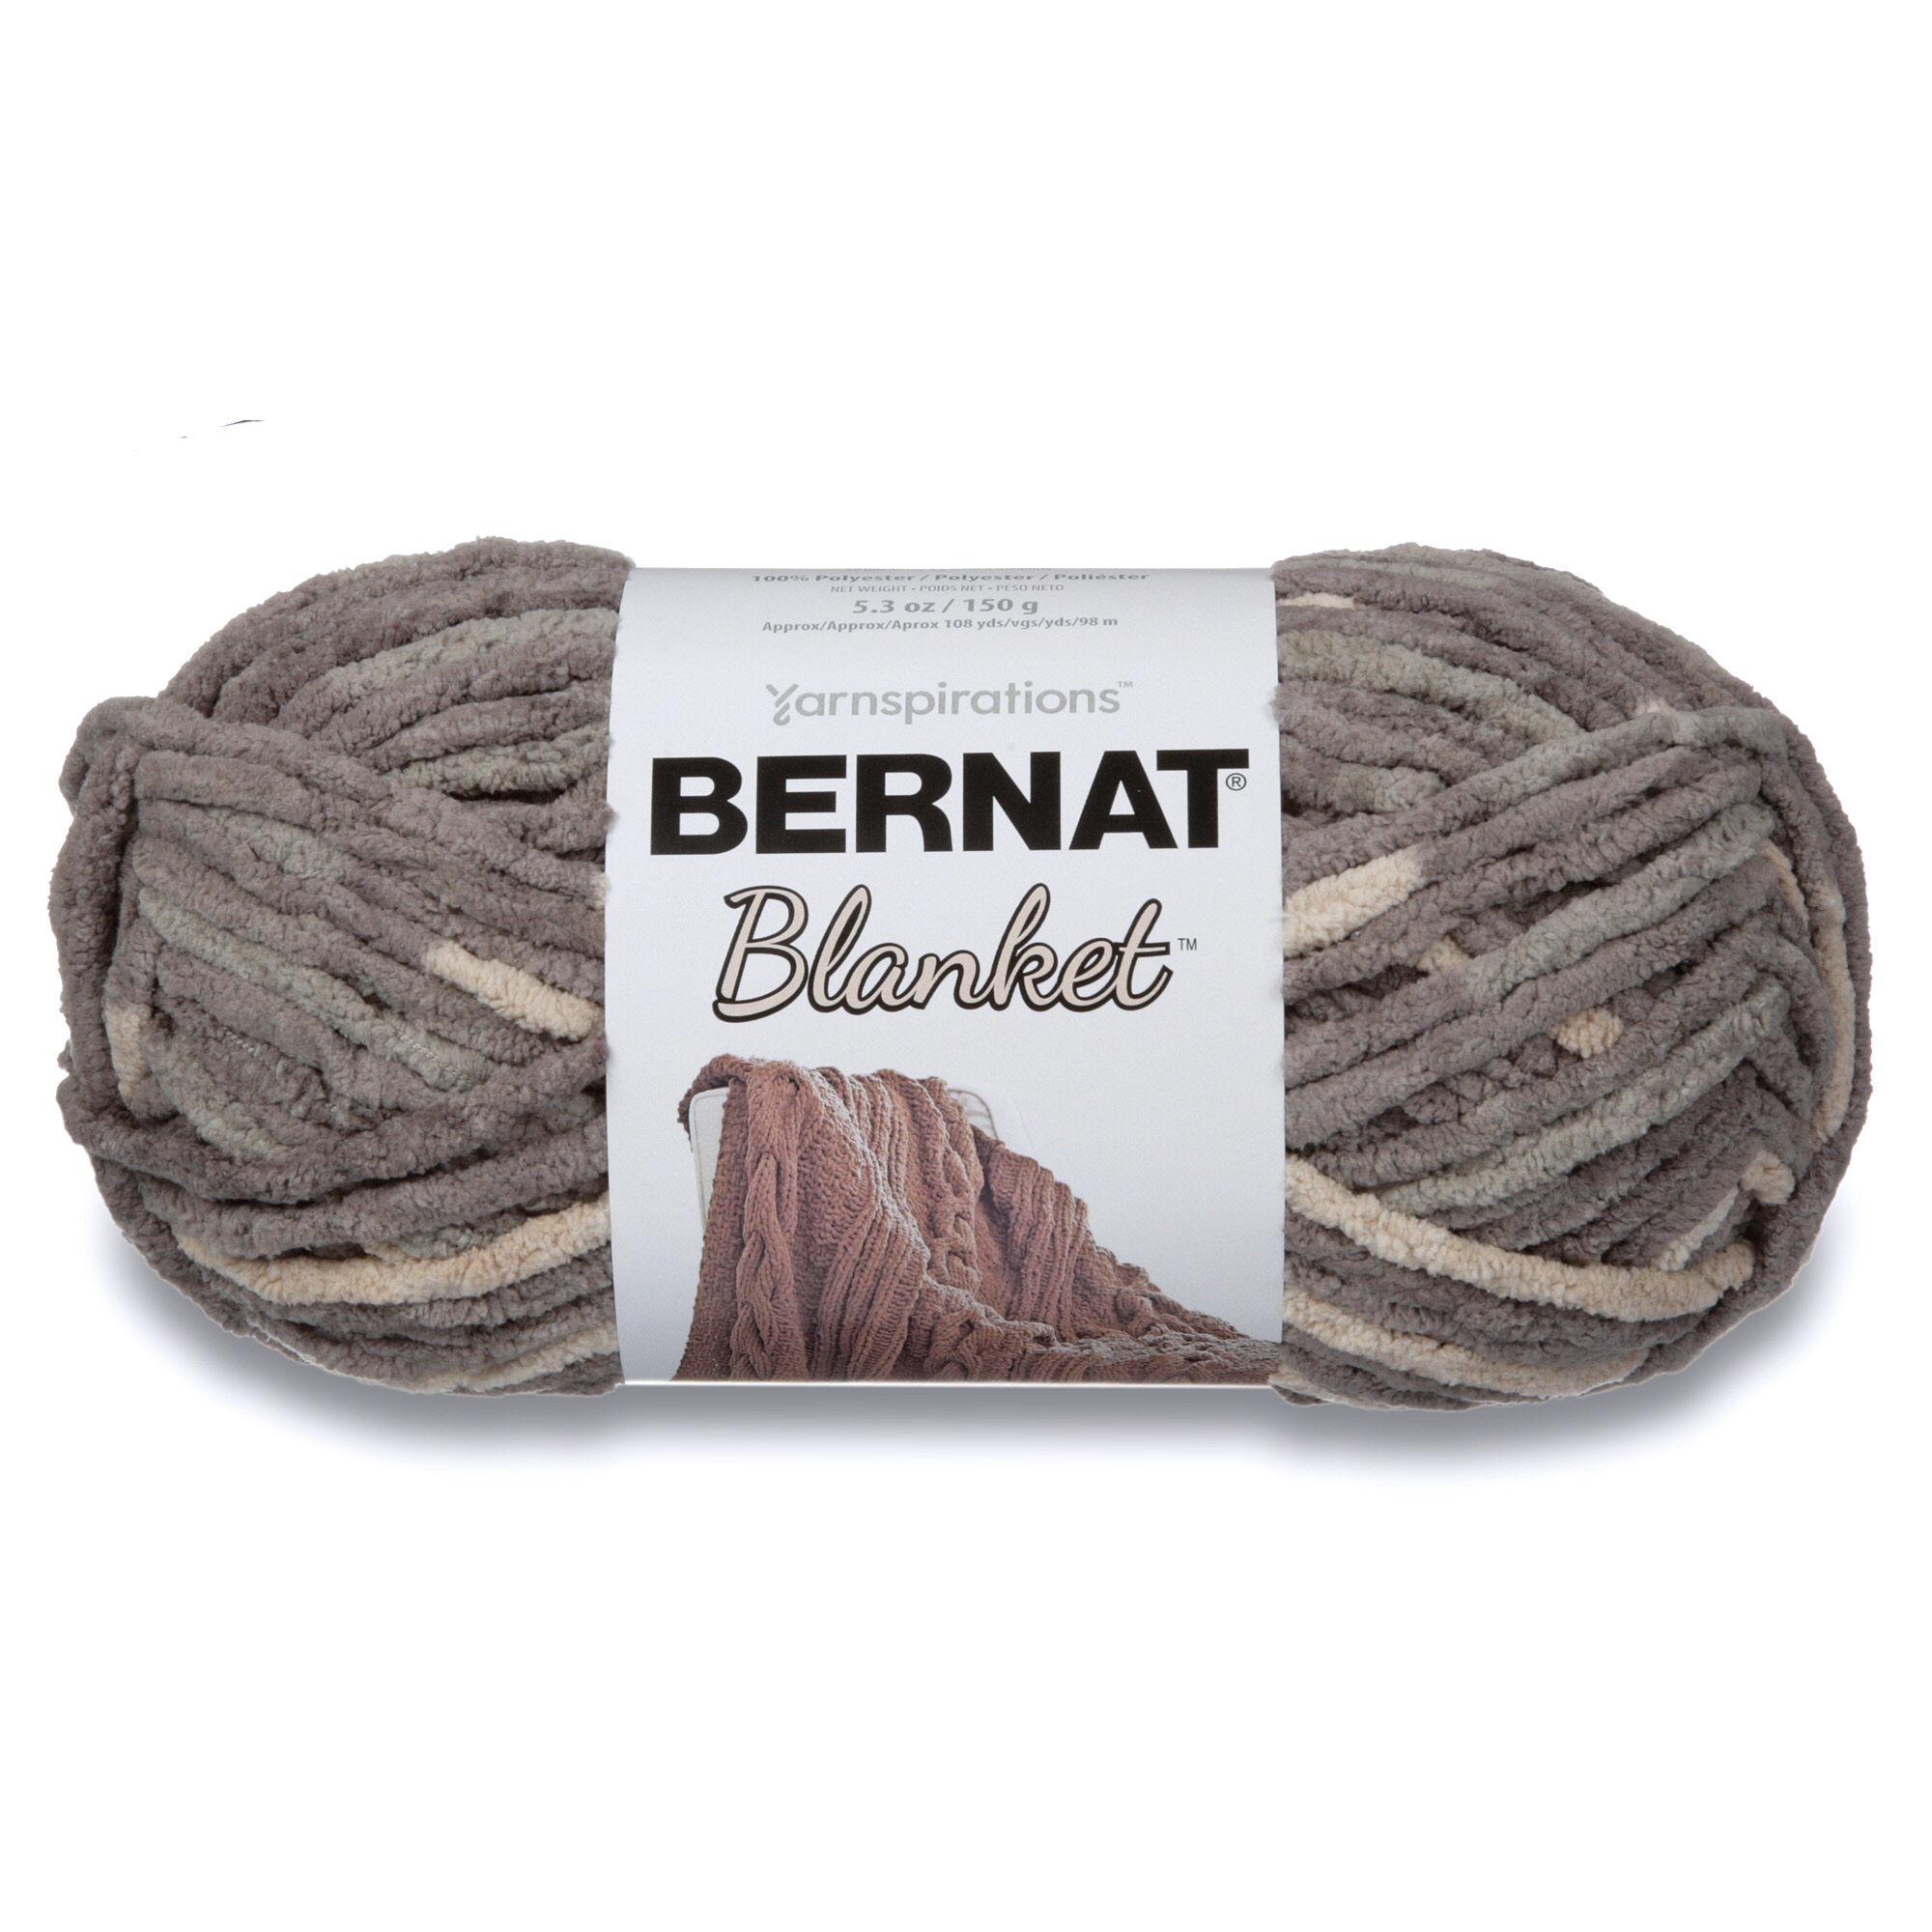 Bernat Blanket Yarn (150g/5 3 oz) Silver Steel | Yarnspirations